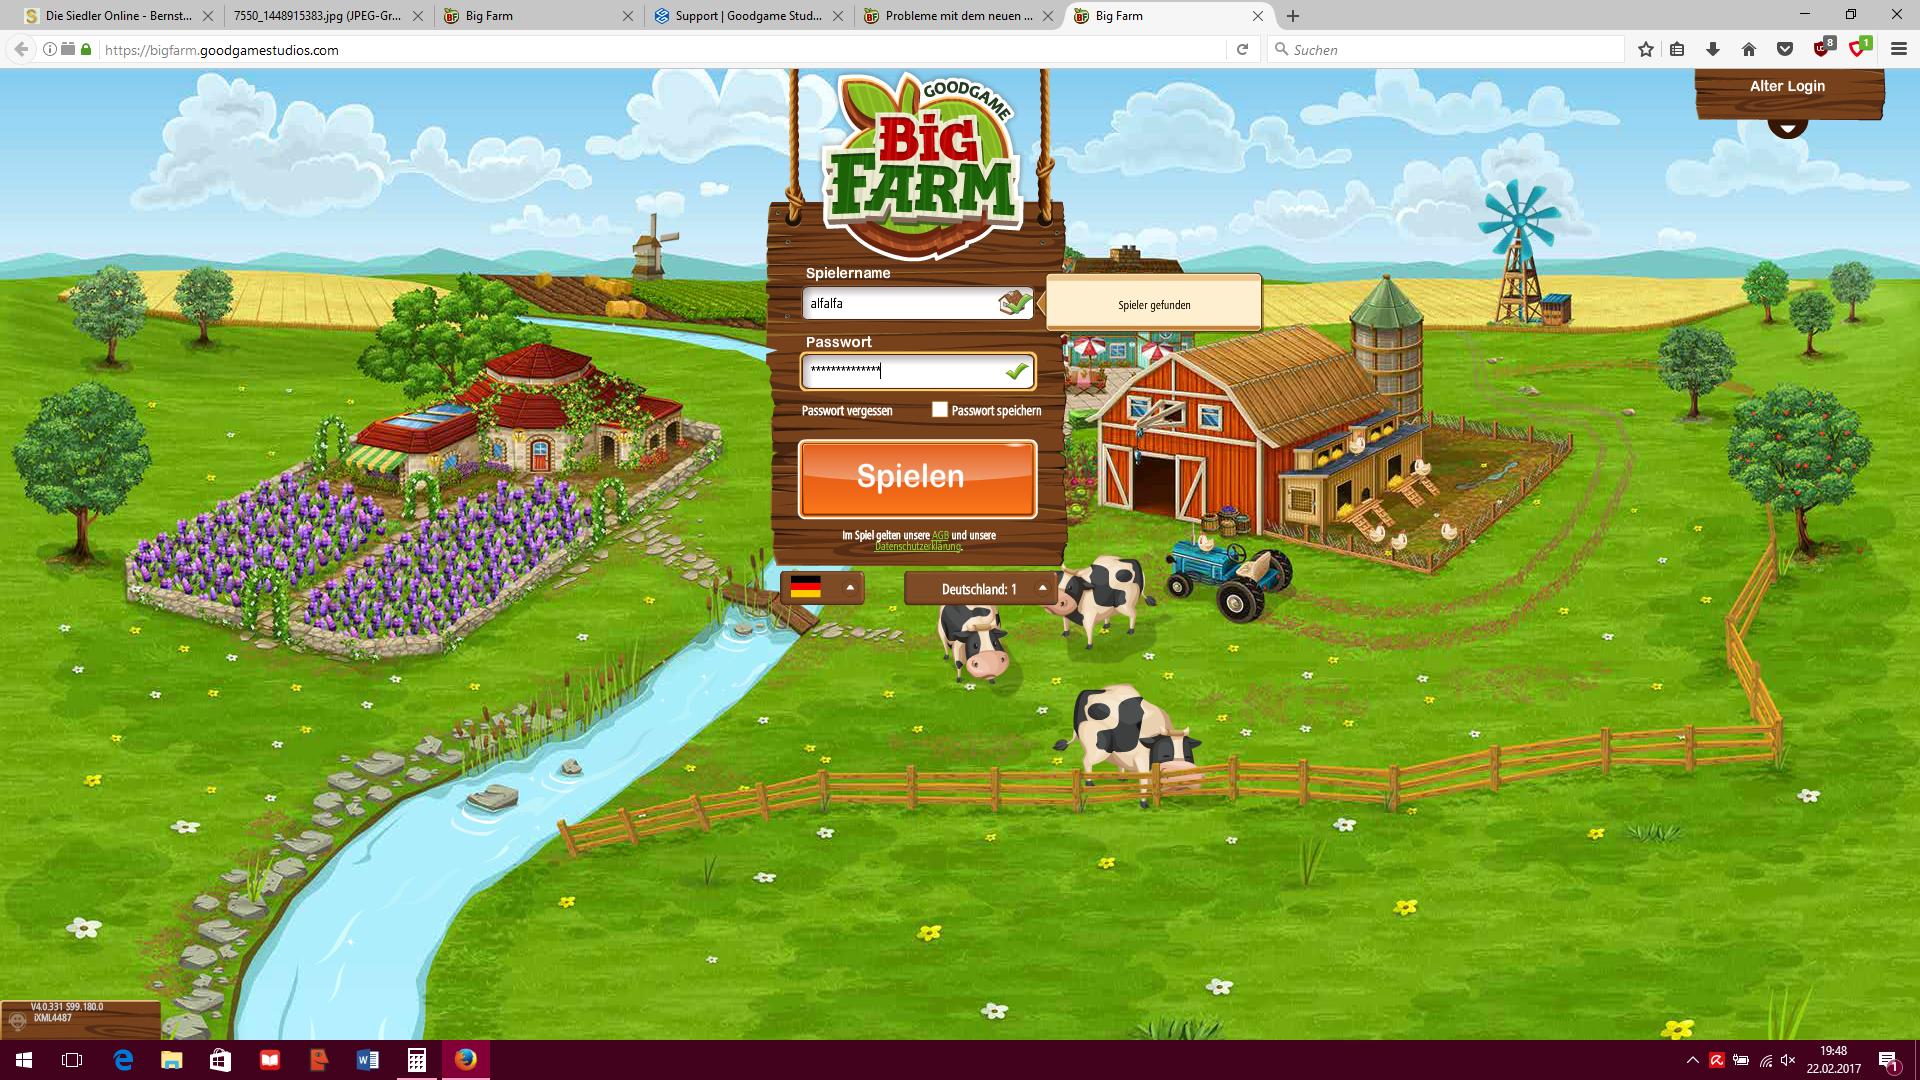 Big Farm Login